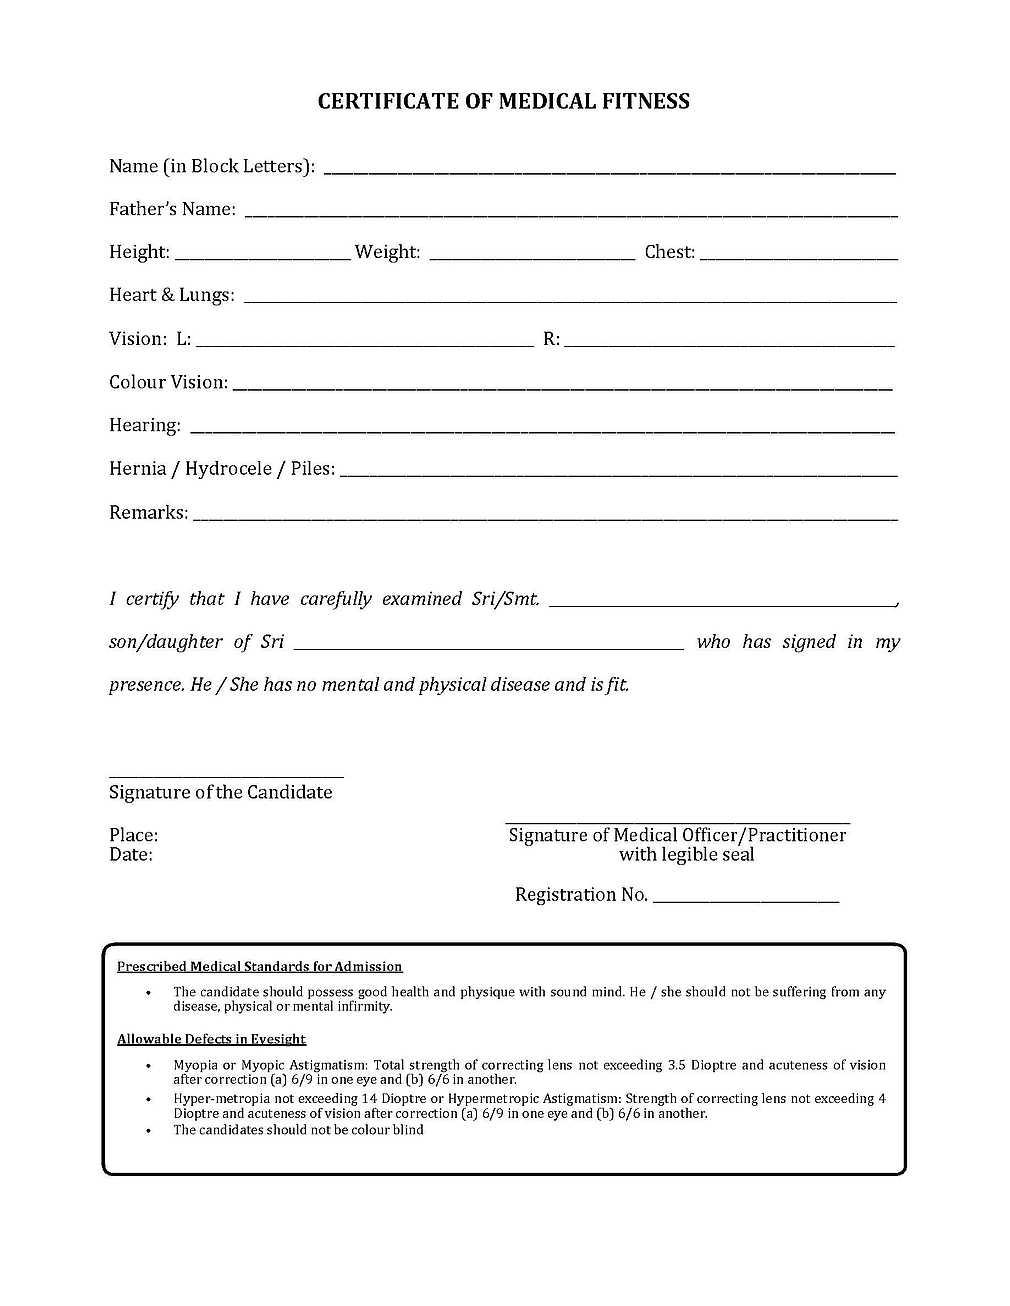 Jexpo medical fitness certificate 2018 2019 eduvark jexpo medical fitness certificate yelopaper Images